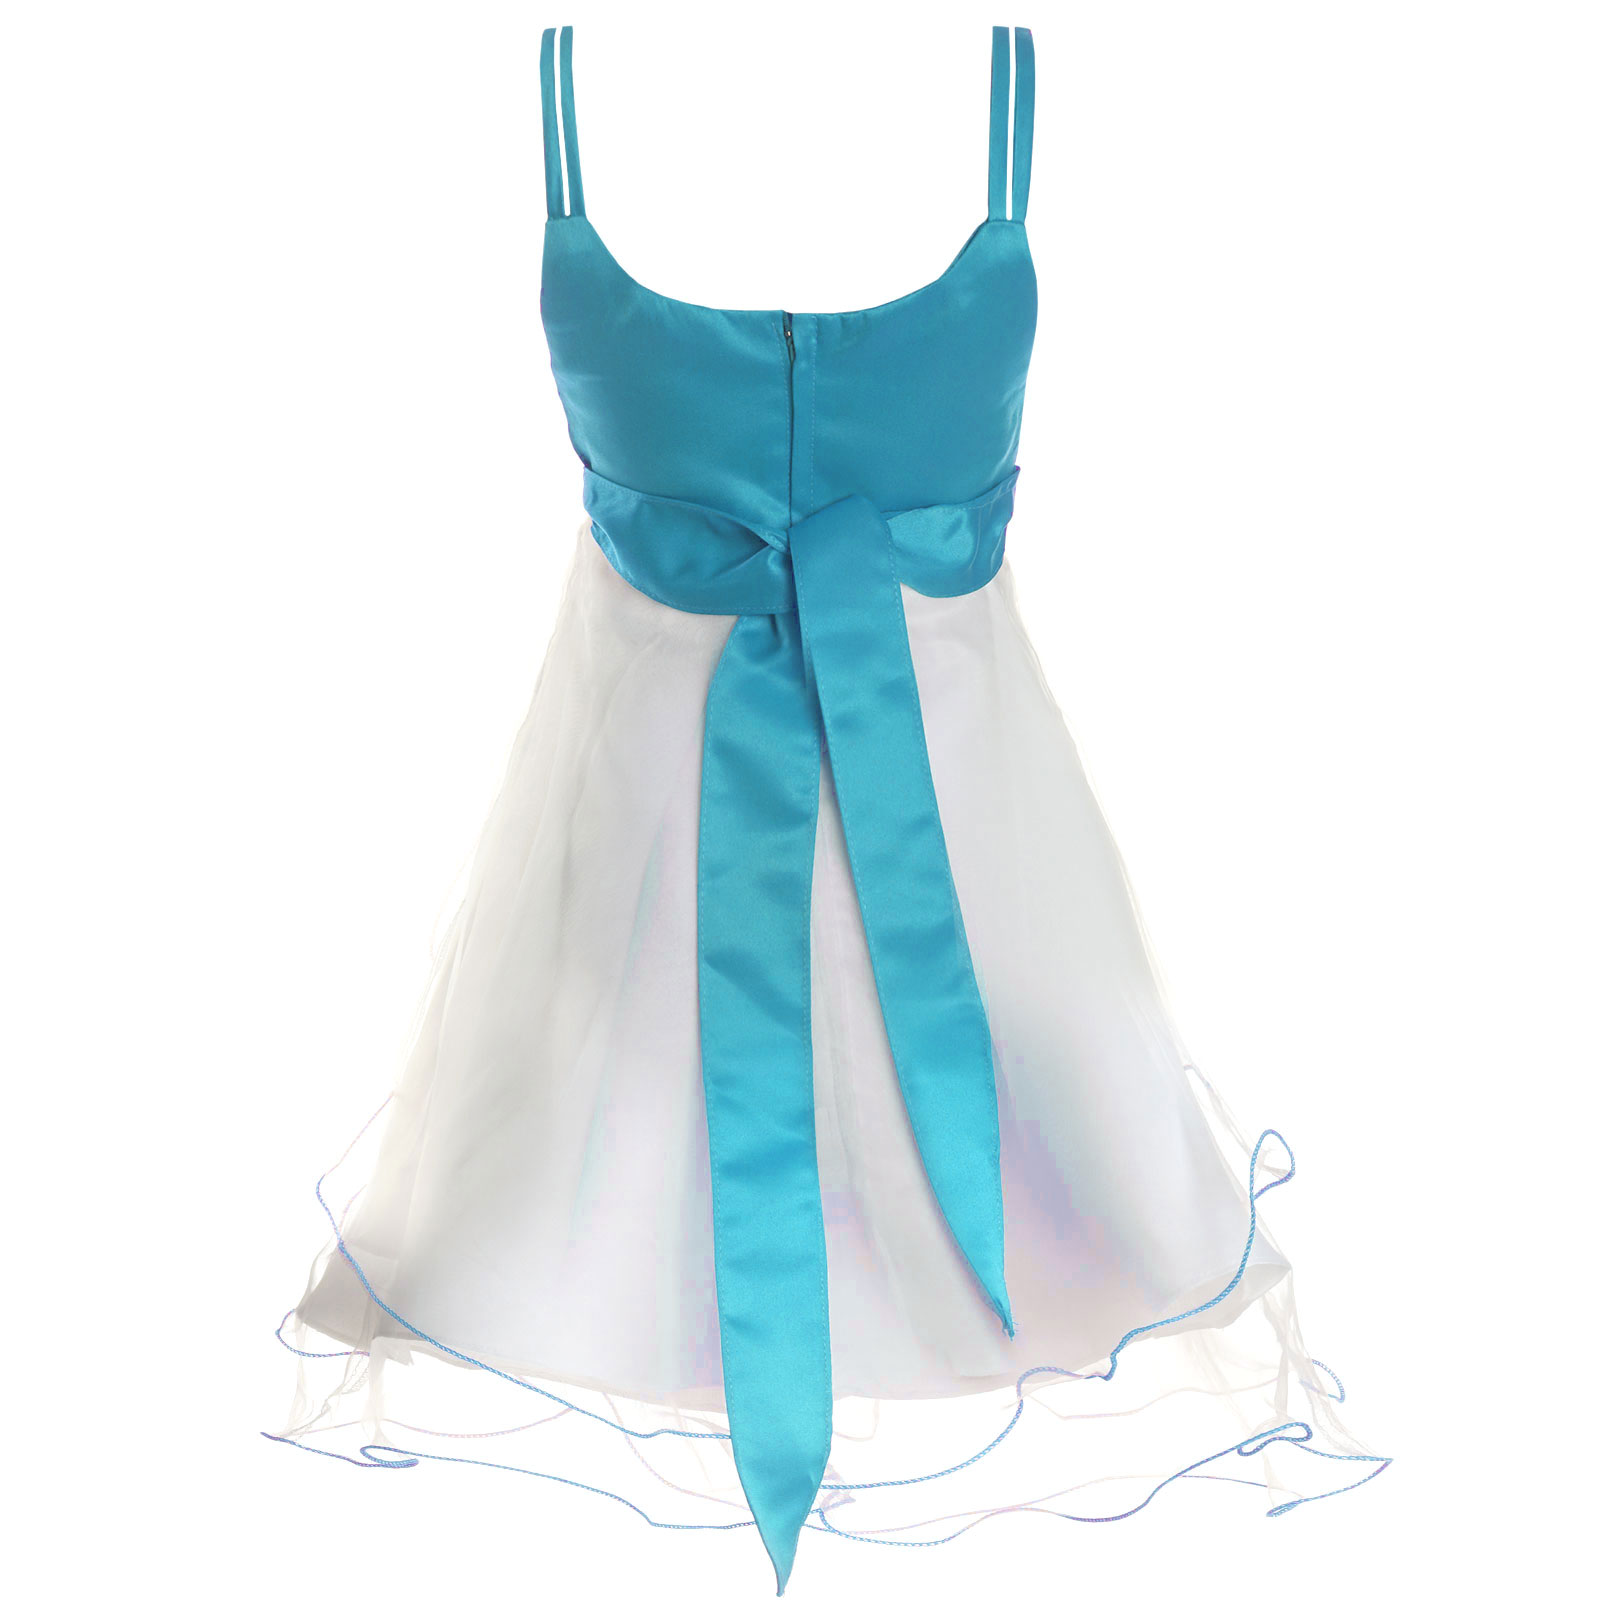 Maedchen-Kinder-Kleid-Peticoat-Festkleid-Lang-Arm-Kostuem-mit-Bolero-Rose-21476 Indexbild 21